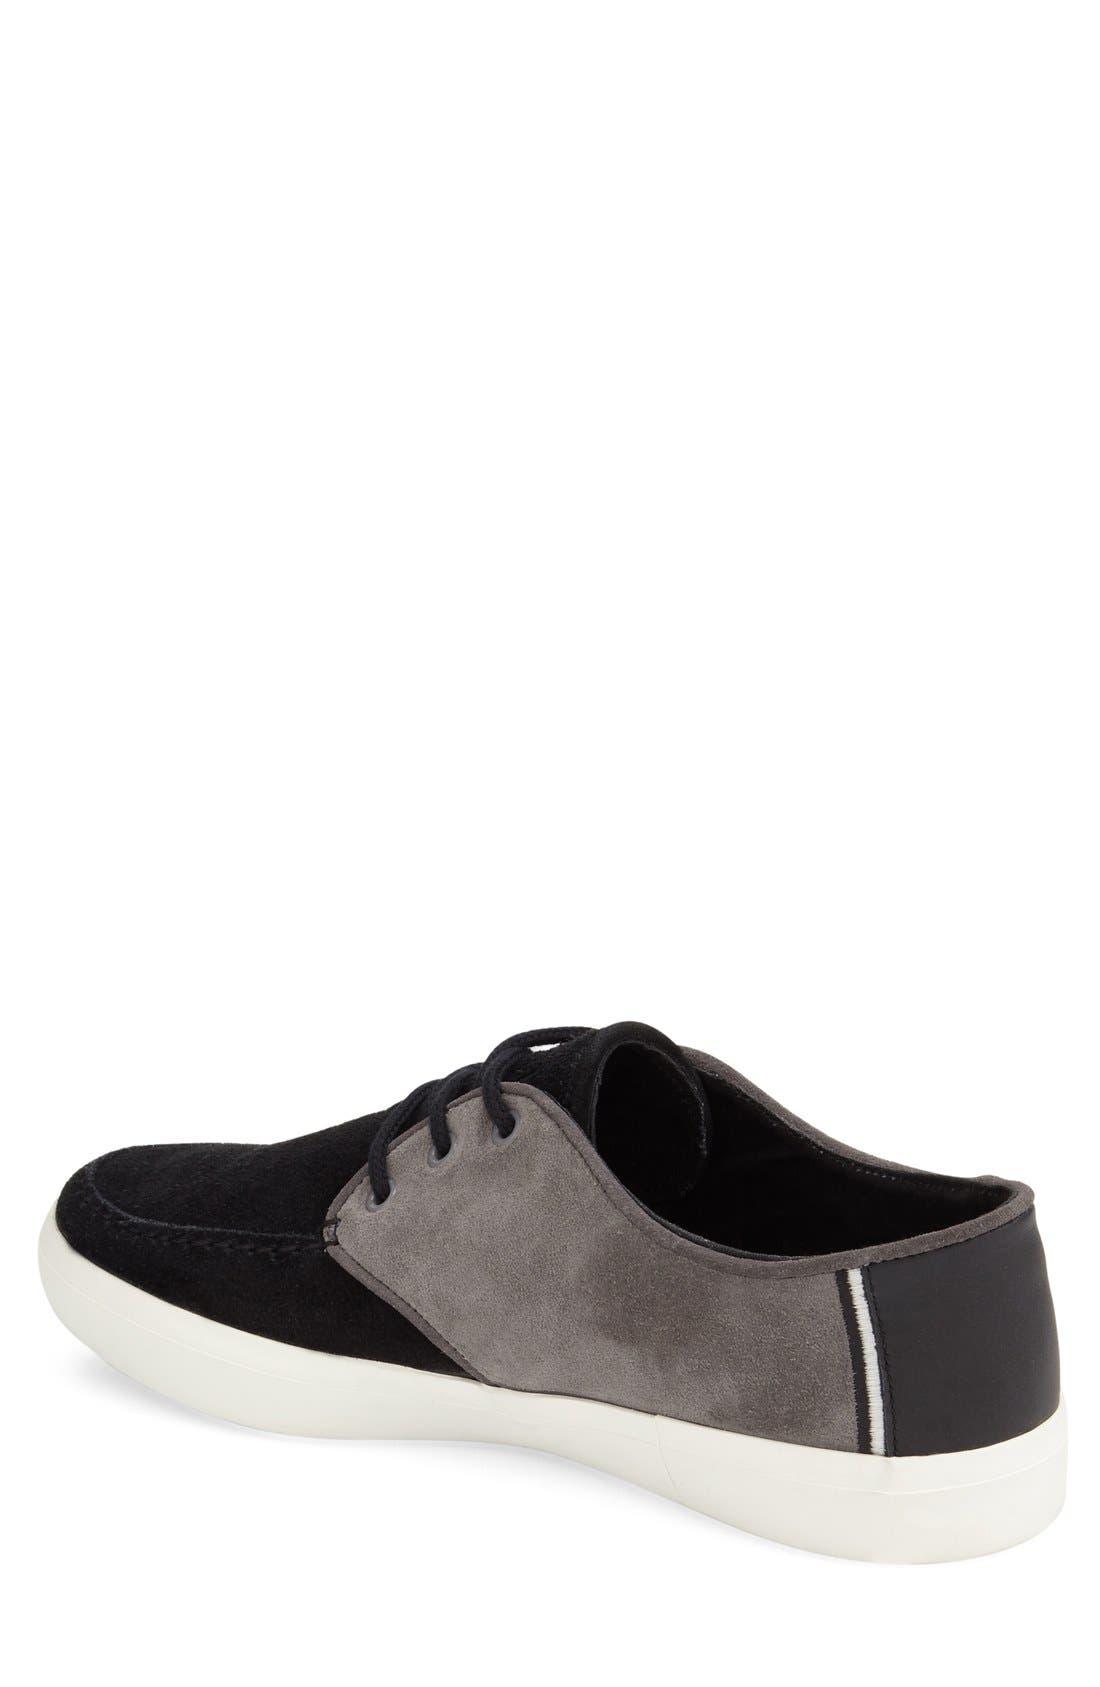 Alternate Image 2  - Lacoste 'Sevrin 1161' Sneaker (Men)